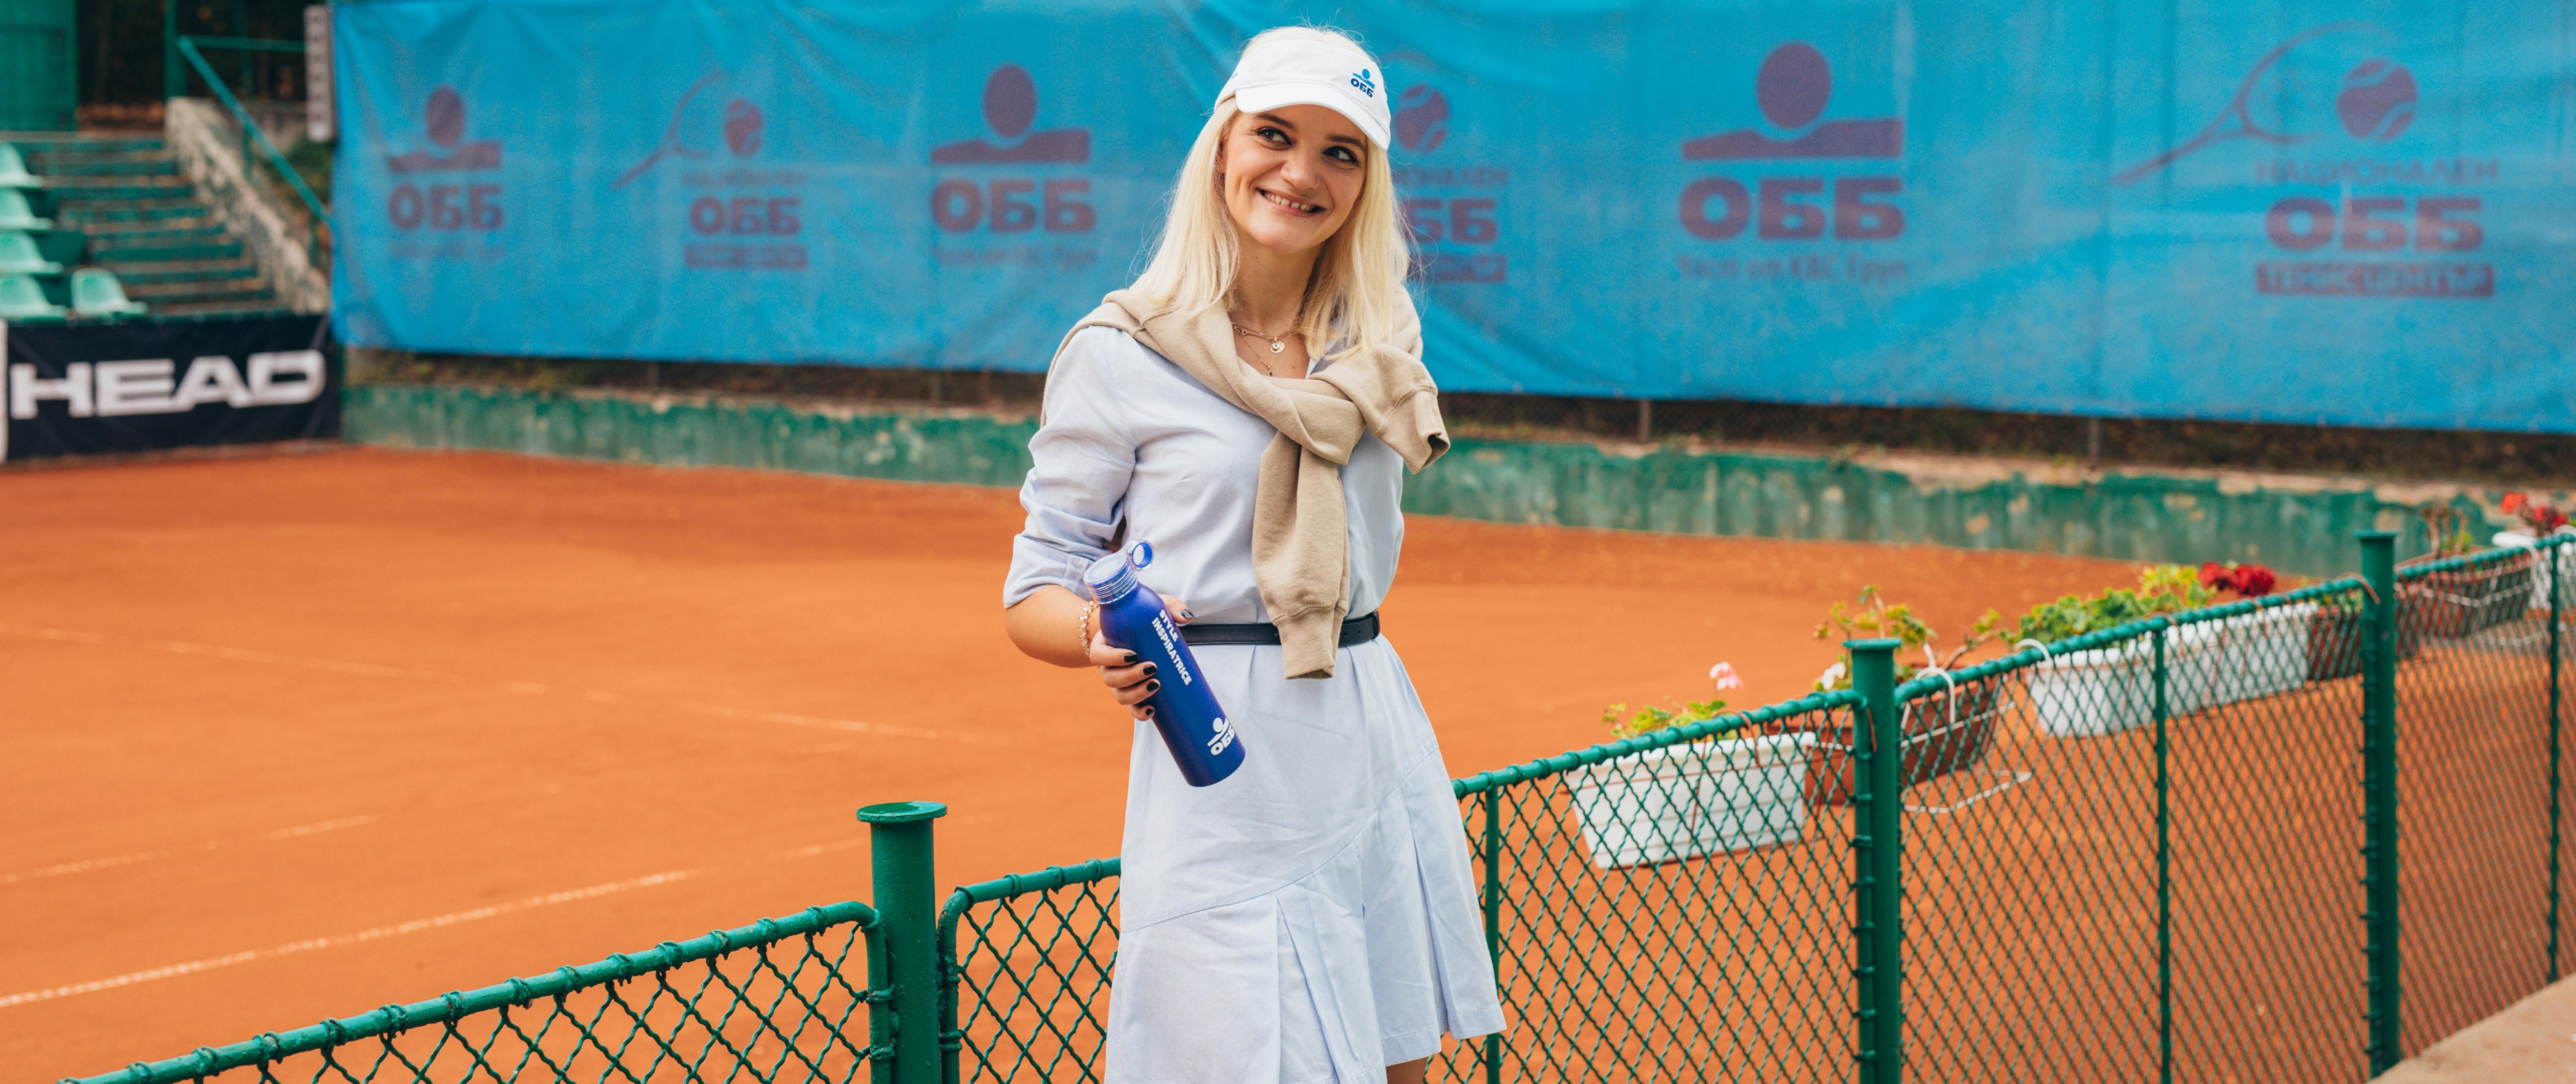 ОББ тенис турнир стайлинг